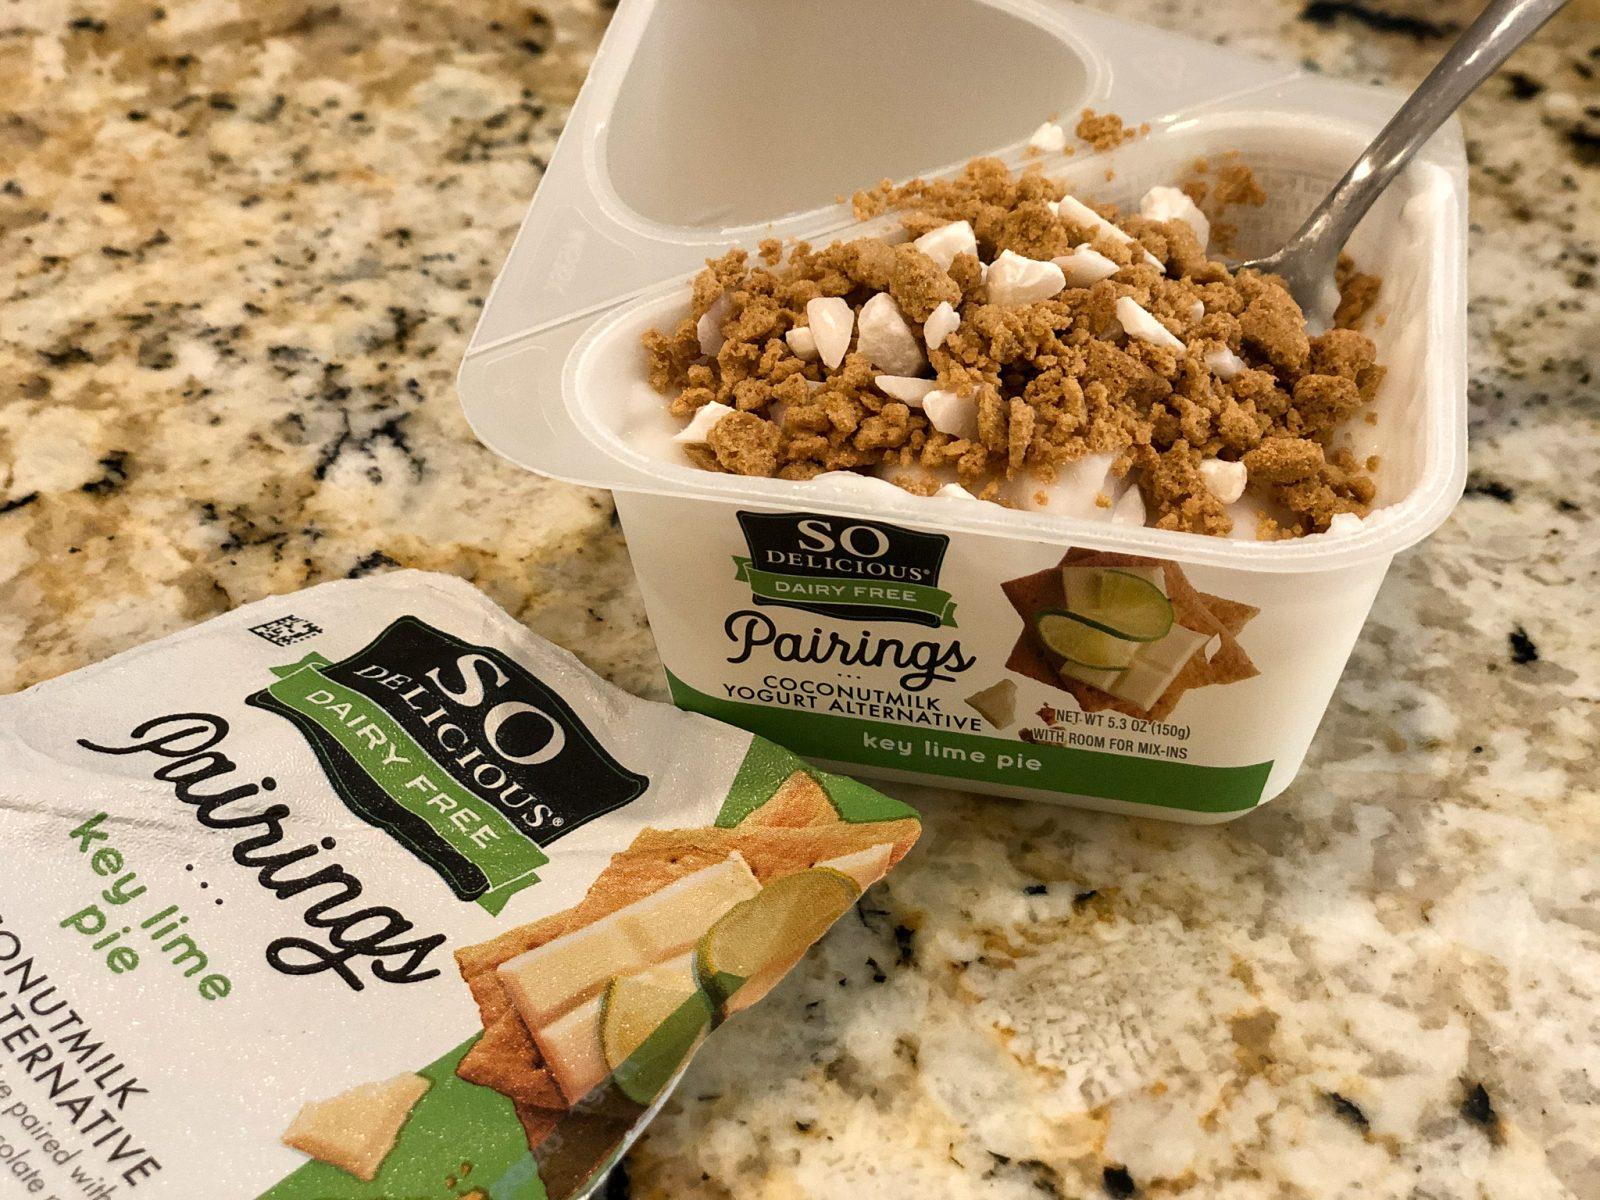 So Delicious Pairings Yogurt Alternative FREE At Publix on I Heart Publix 1